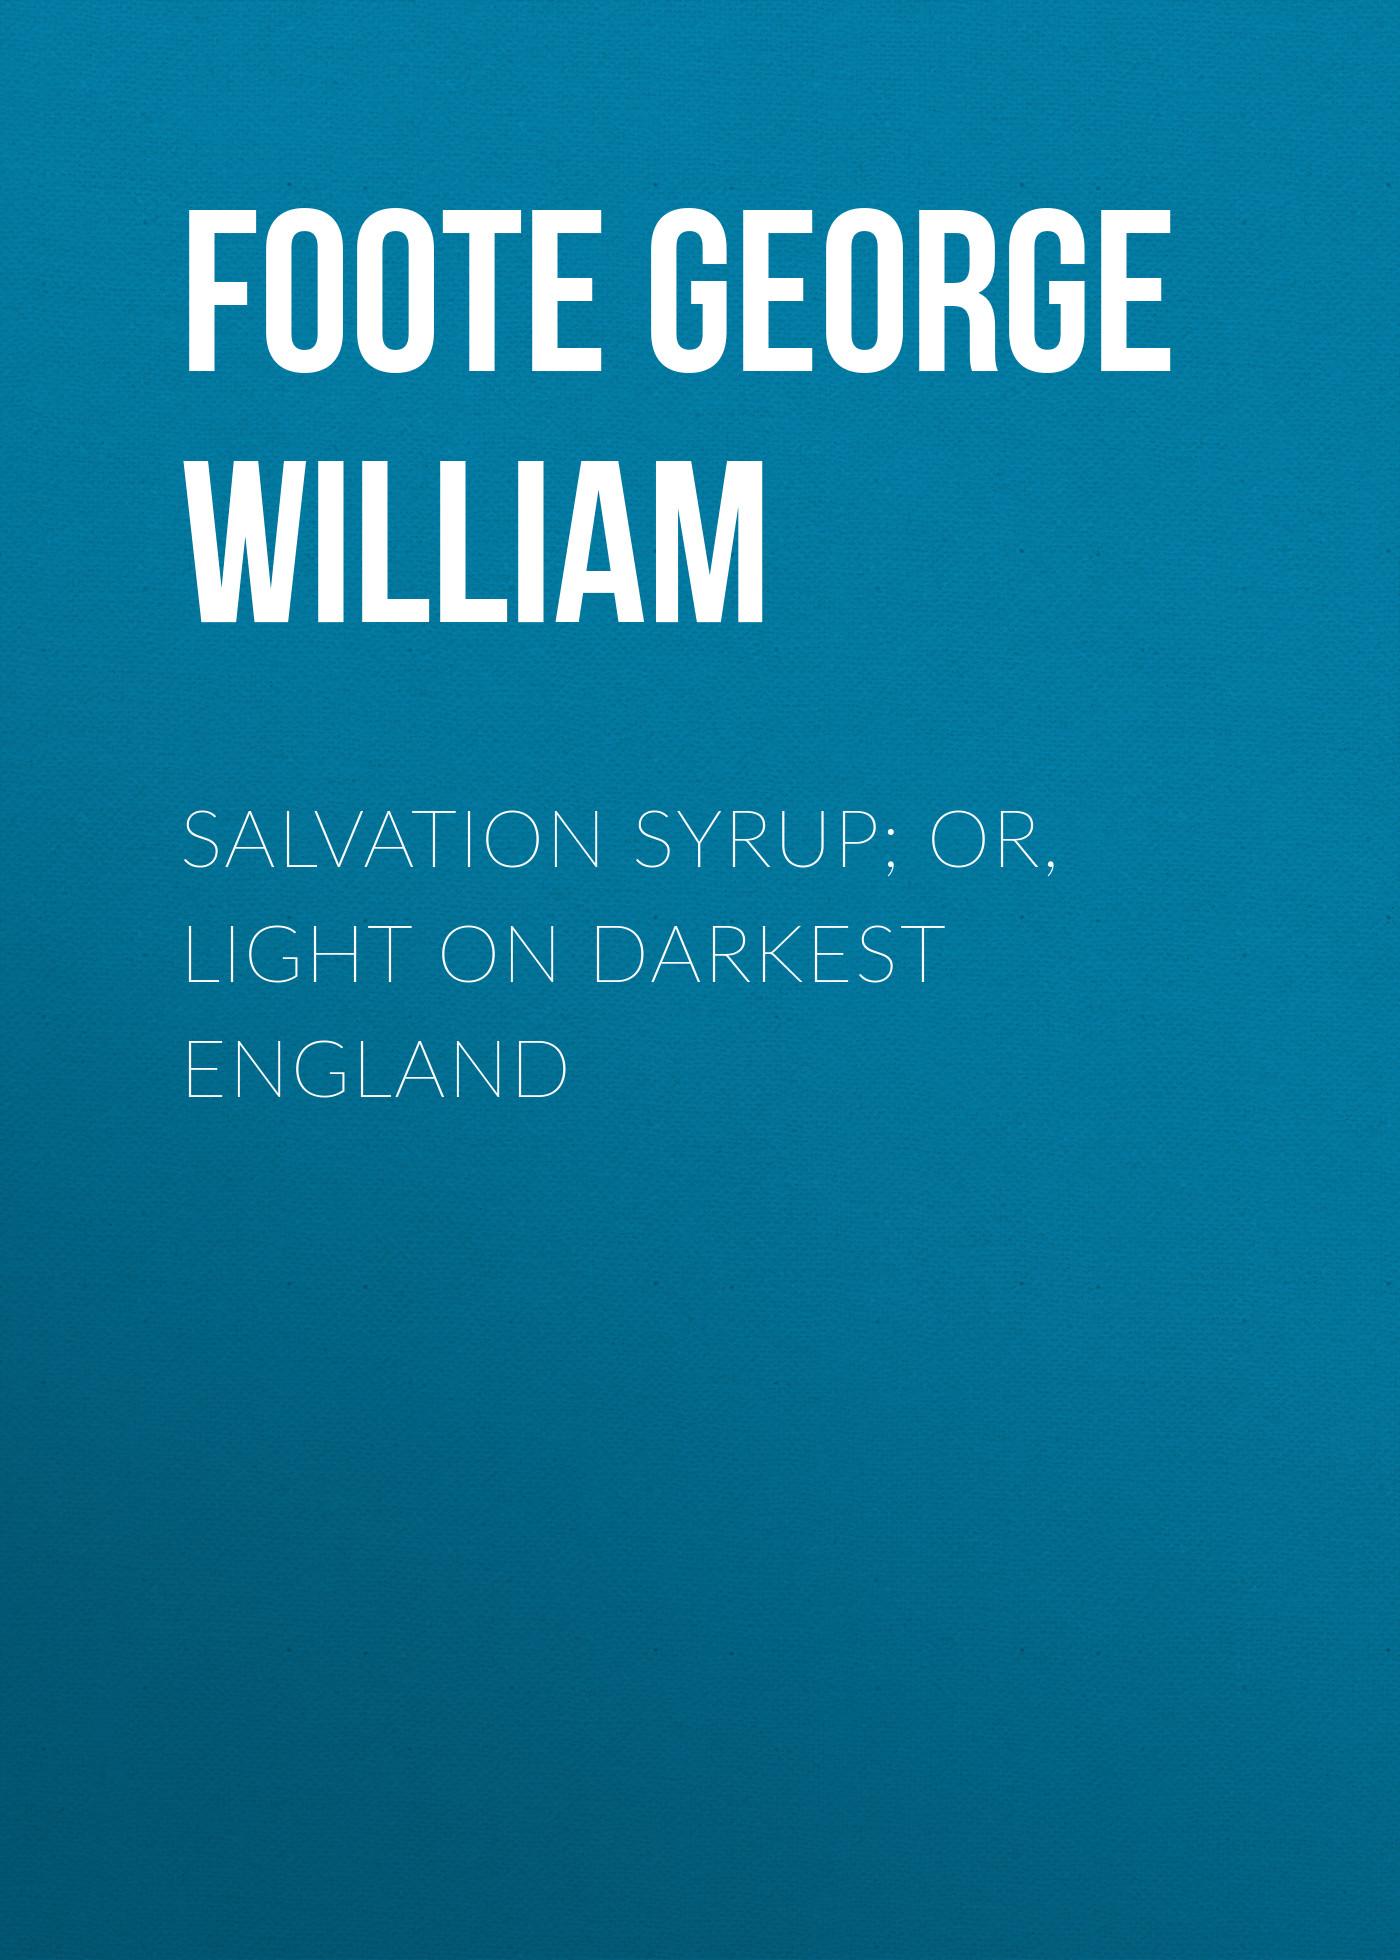 Foote George William Salvation Syrup; Or, Light On Darkest England foote george william reminiscences of charles bradlaugh